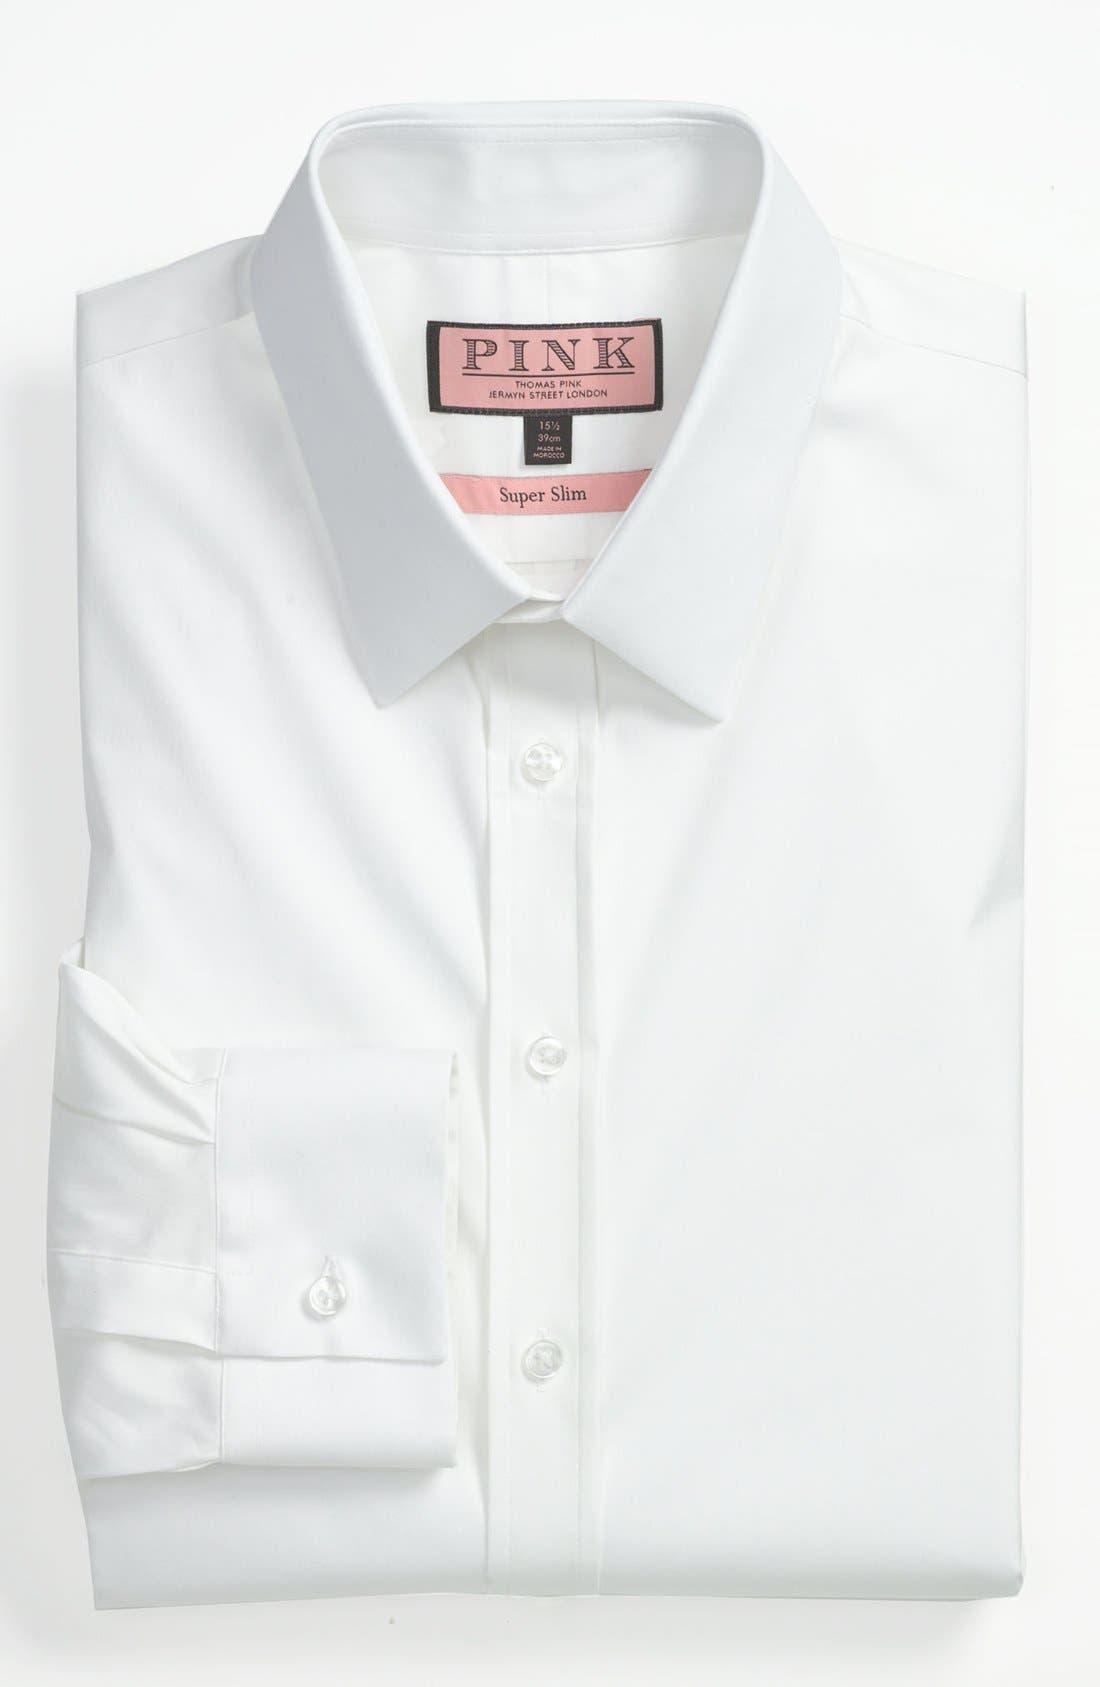 Alternate Image 1 Selected - Thomas Pink 'Freddie' Solid Cotton Stretch Super Slim Fit Dress Shirt